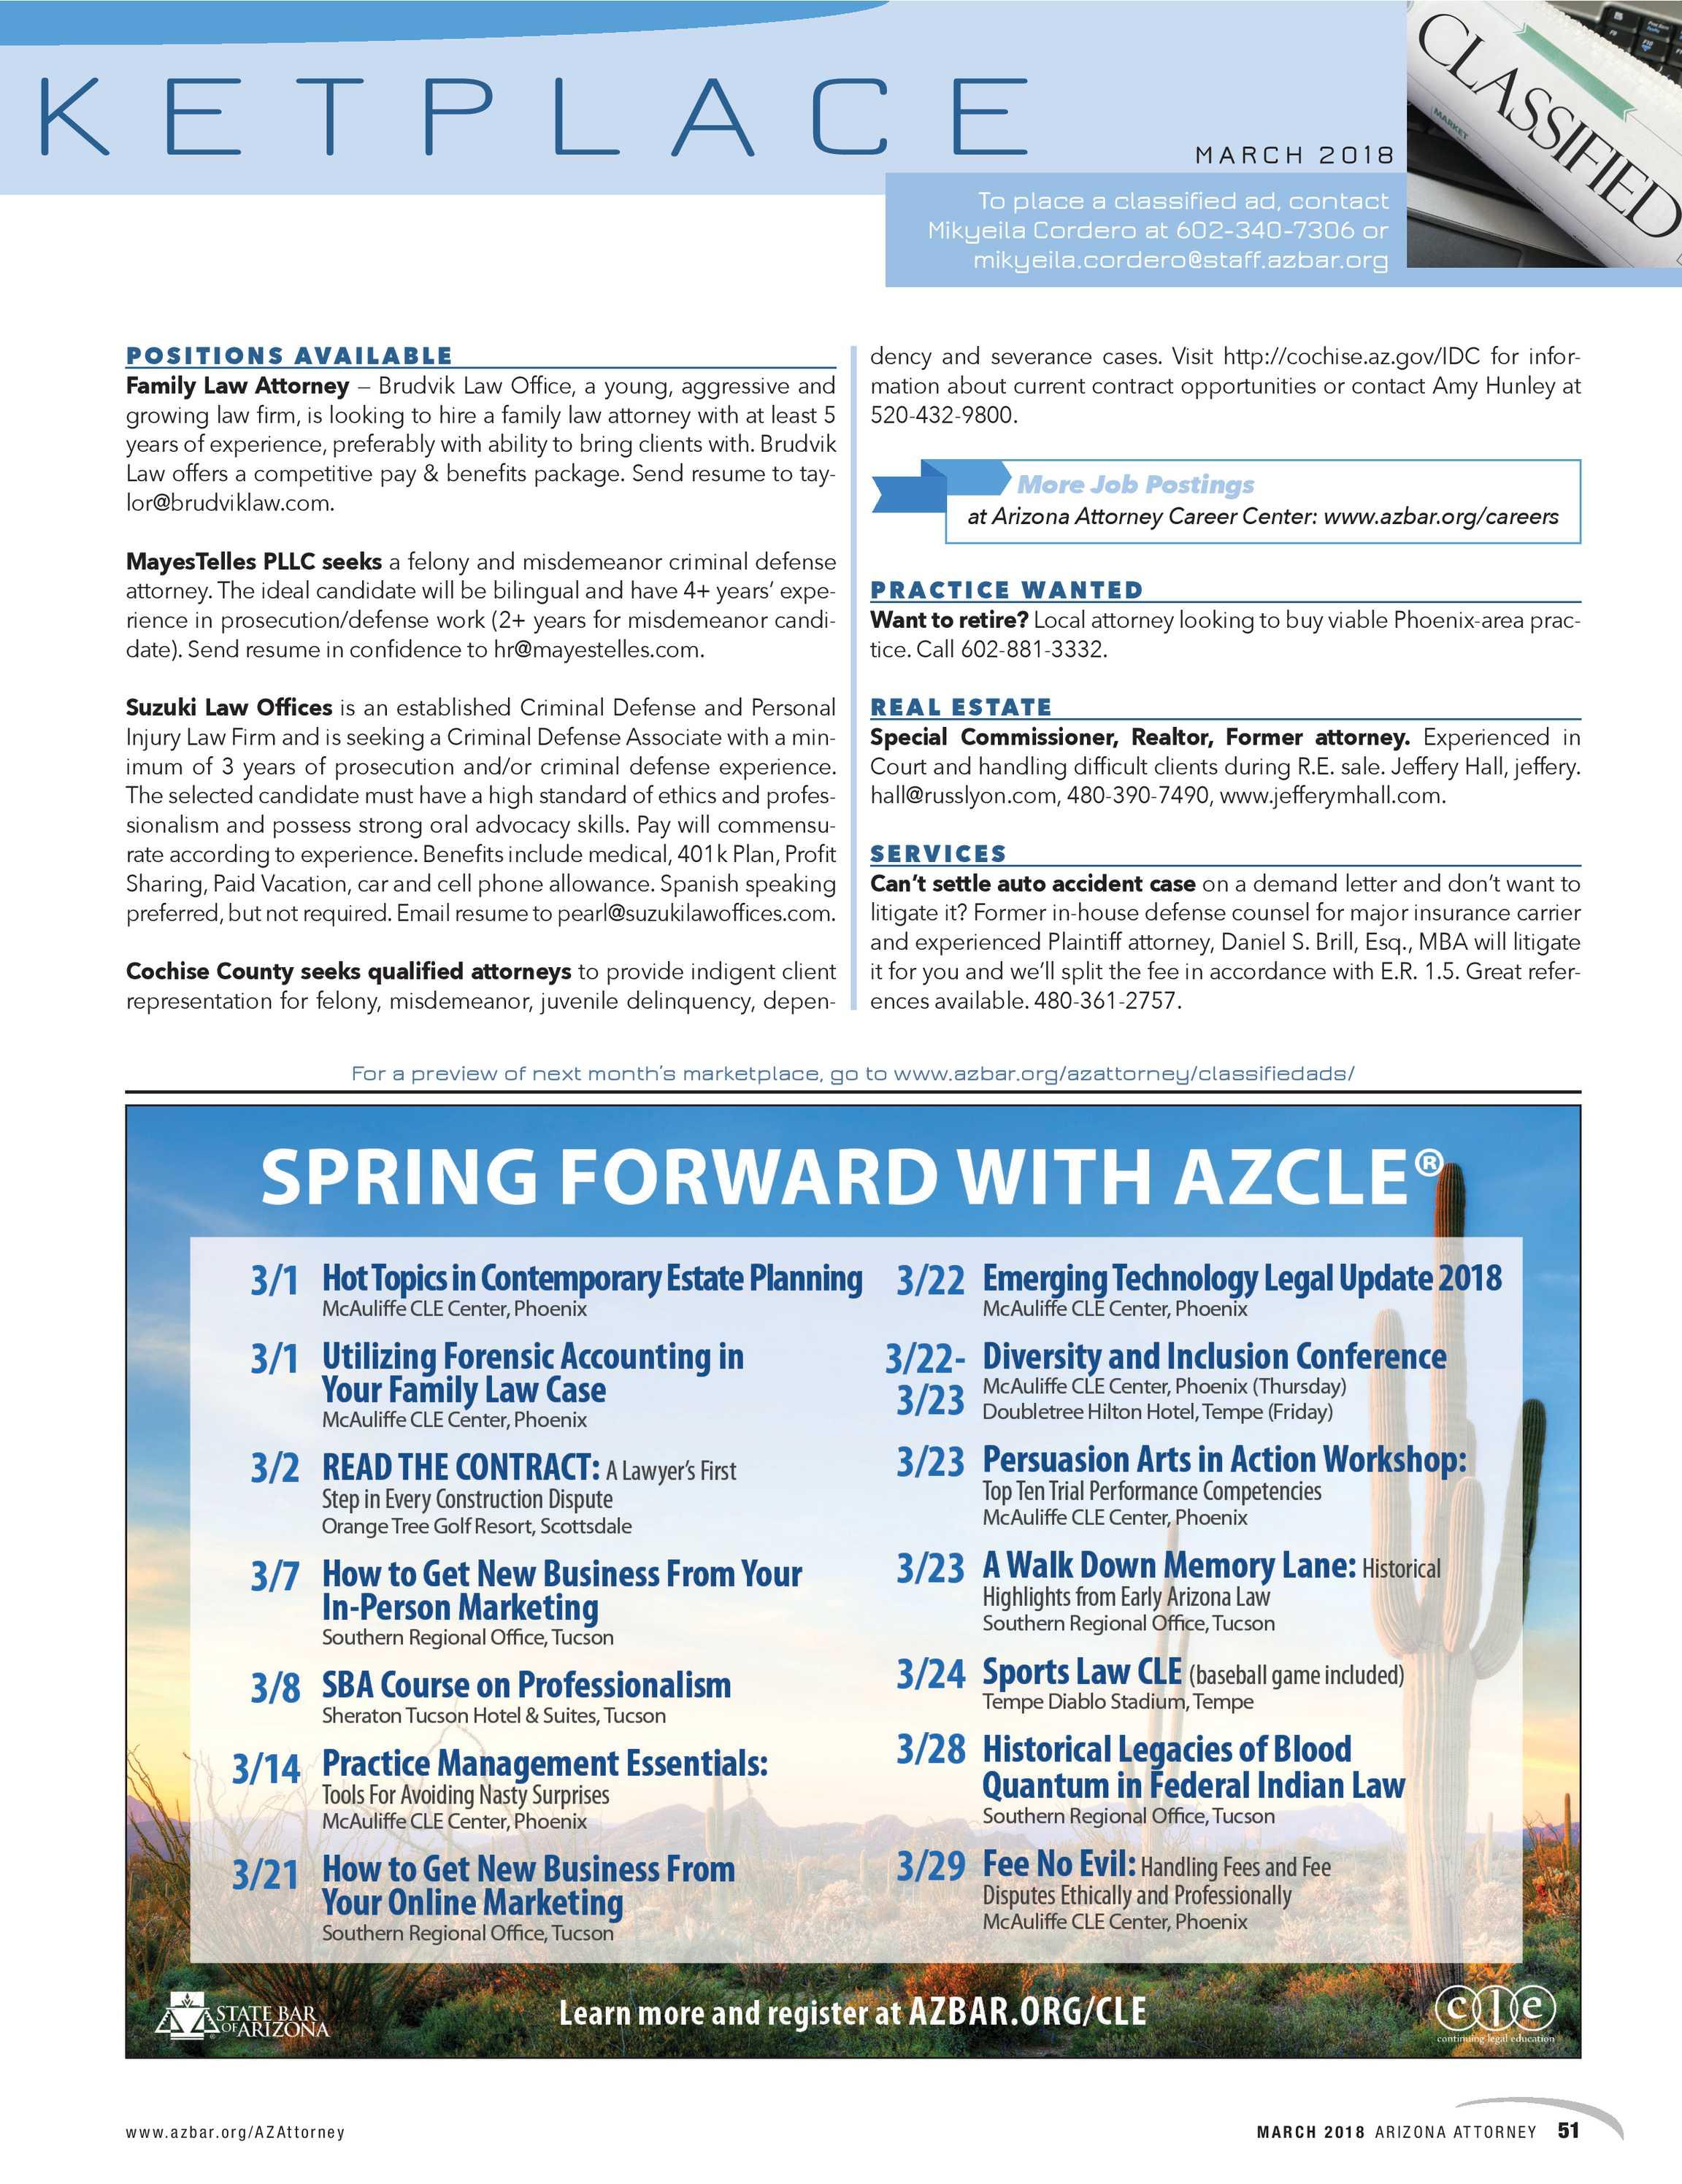 Arizona Attorney - March 2018 - page 50